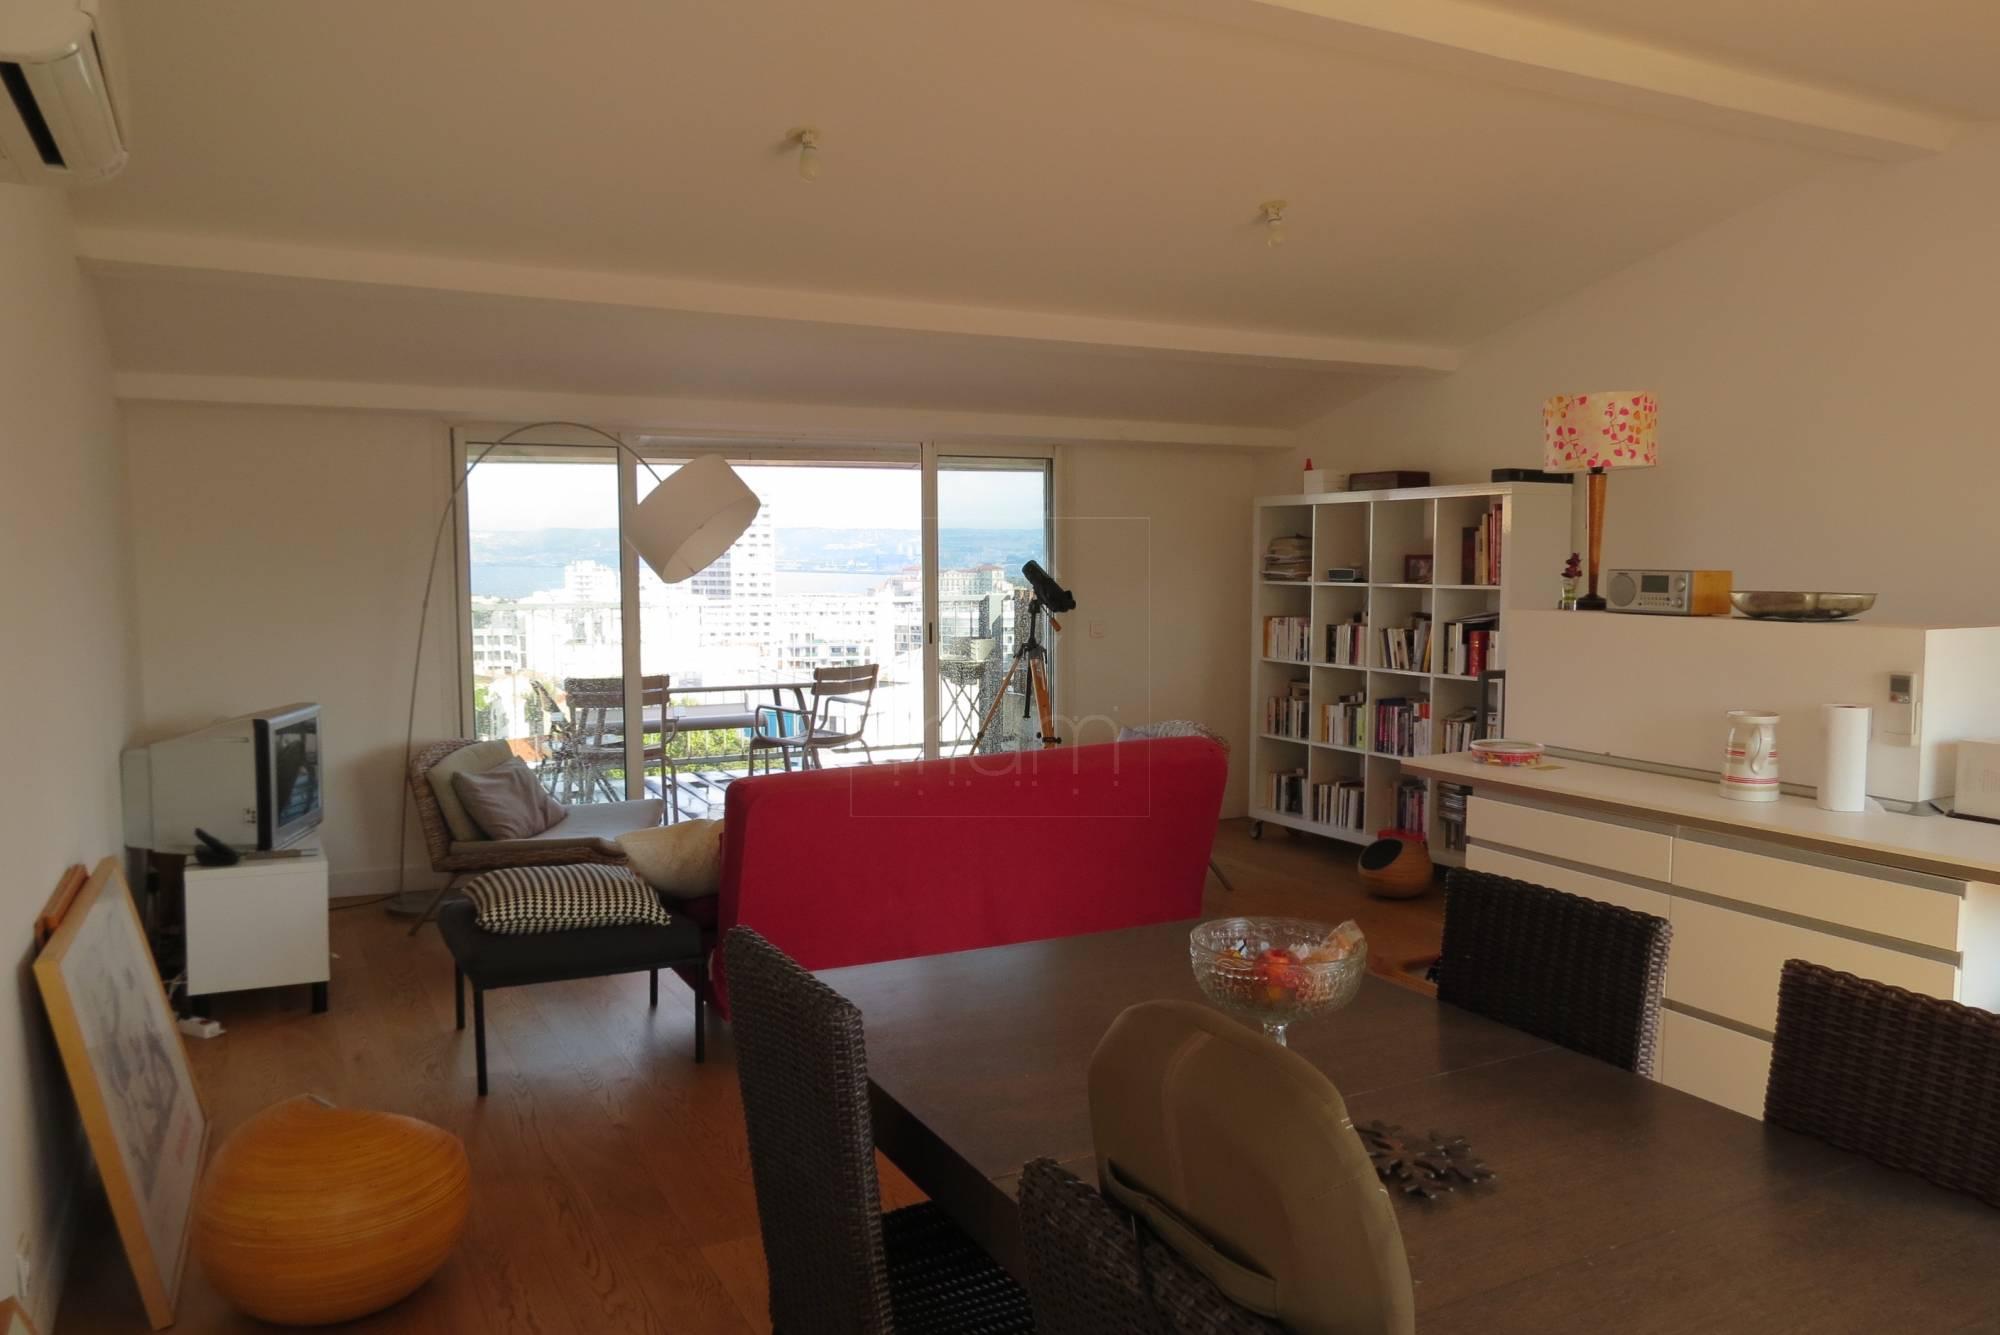 vente appartement t3 f3 marseille 13007 bompard dernier tage grande terrasse vue mer agence. Black Bedroom Furniture Sets. Home Design Ideas